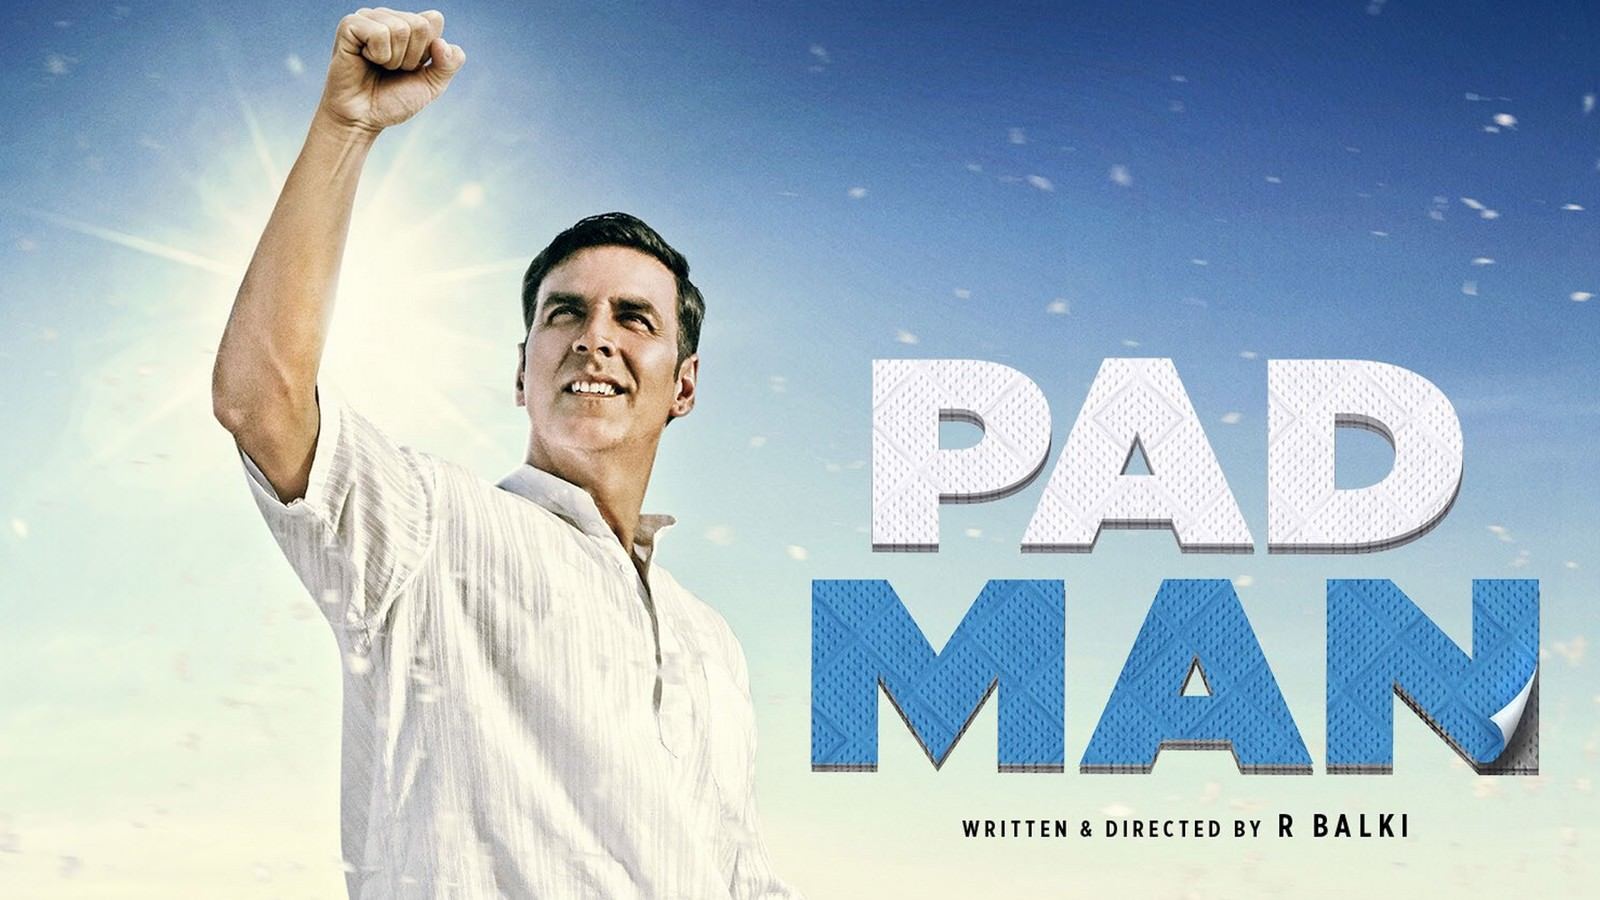 Movie, PadMan(印度, 2018年) / 護墊俠(台灣) / 印度合伙人(中國), 電影海報, 印度, 橫板